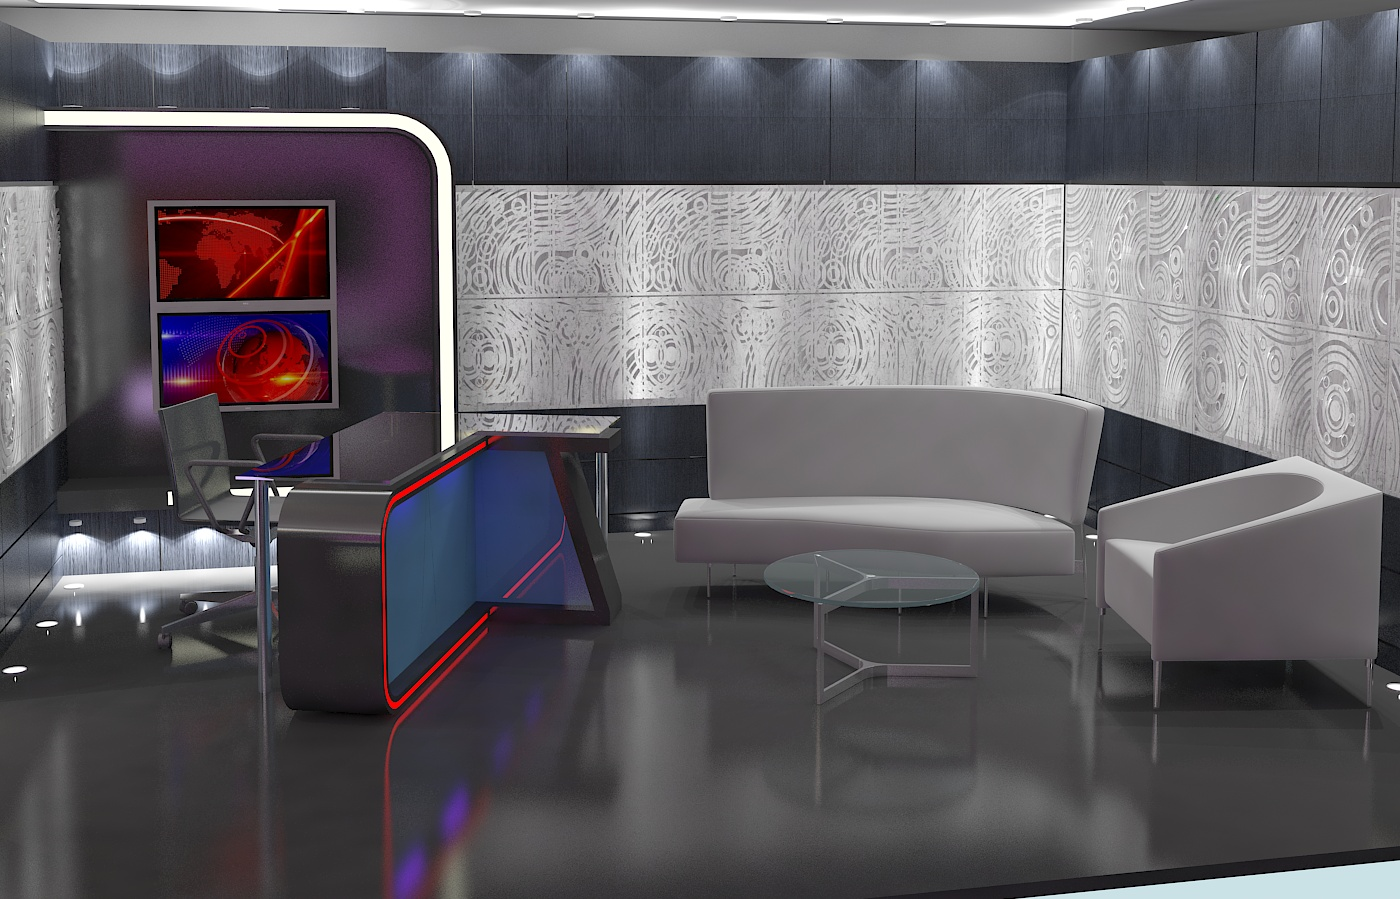 virtual tv studio news set 16 3d model 3ds max dxf fbx obj 223692